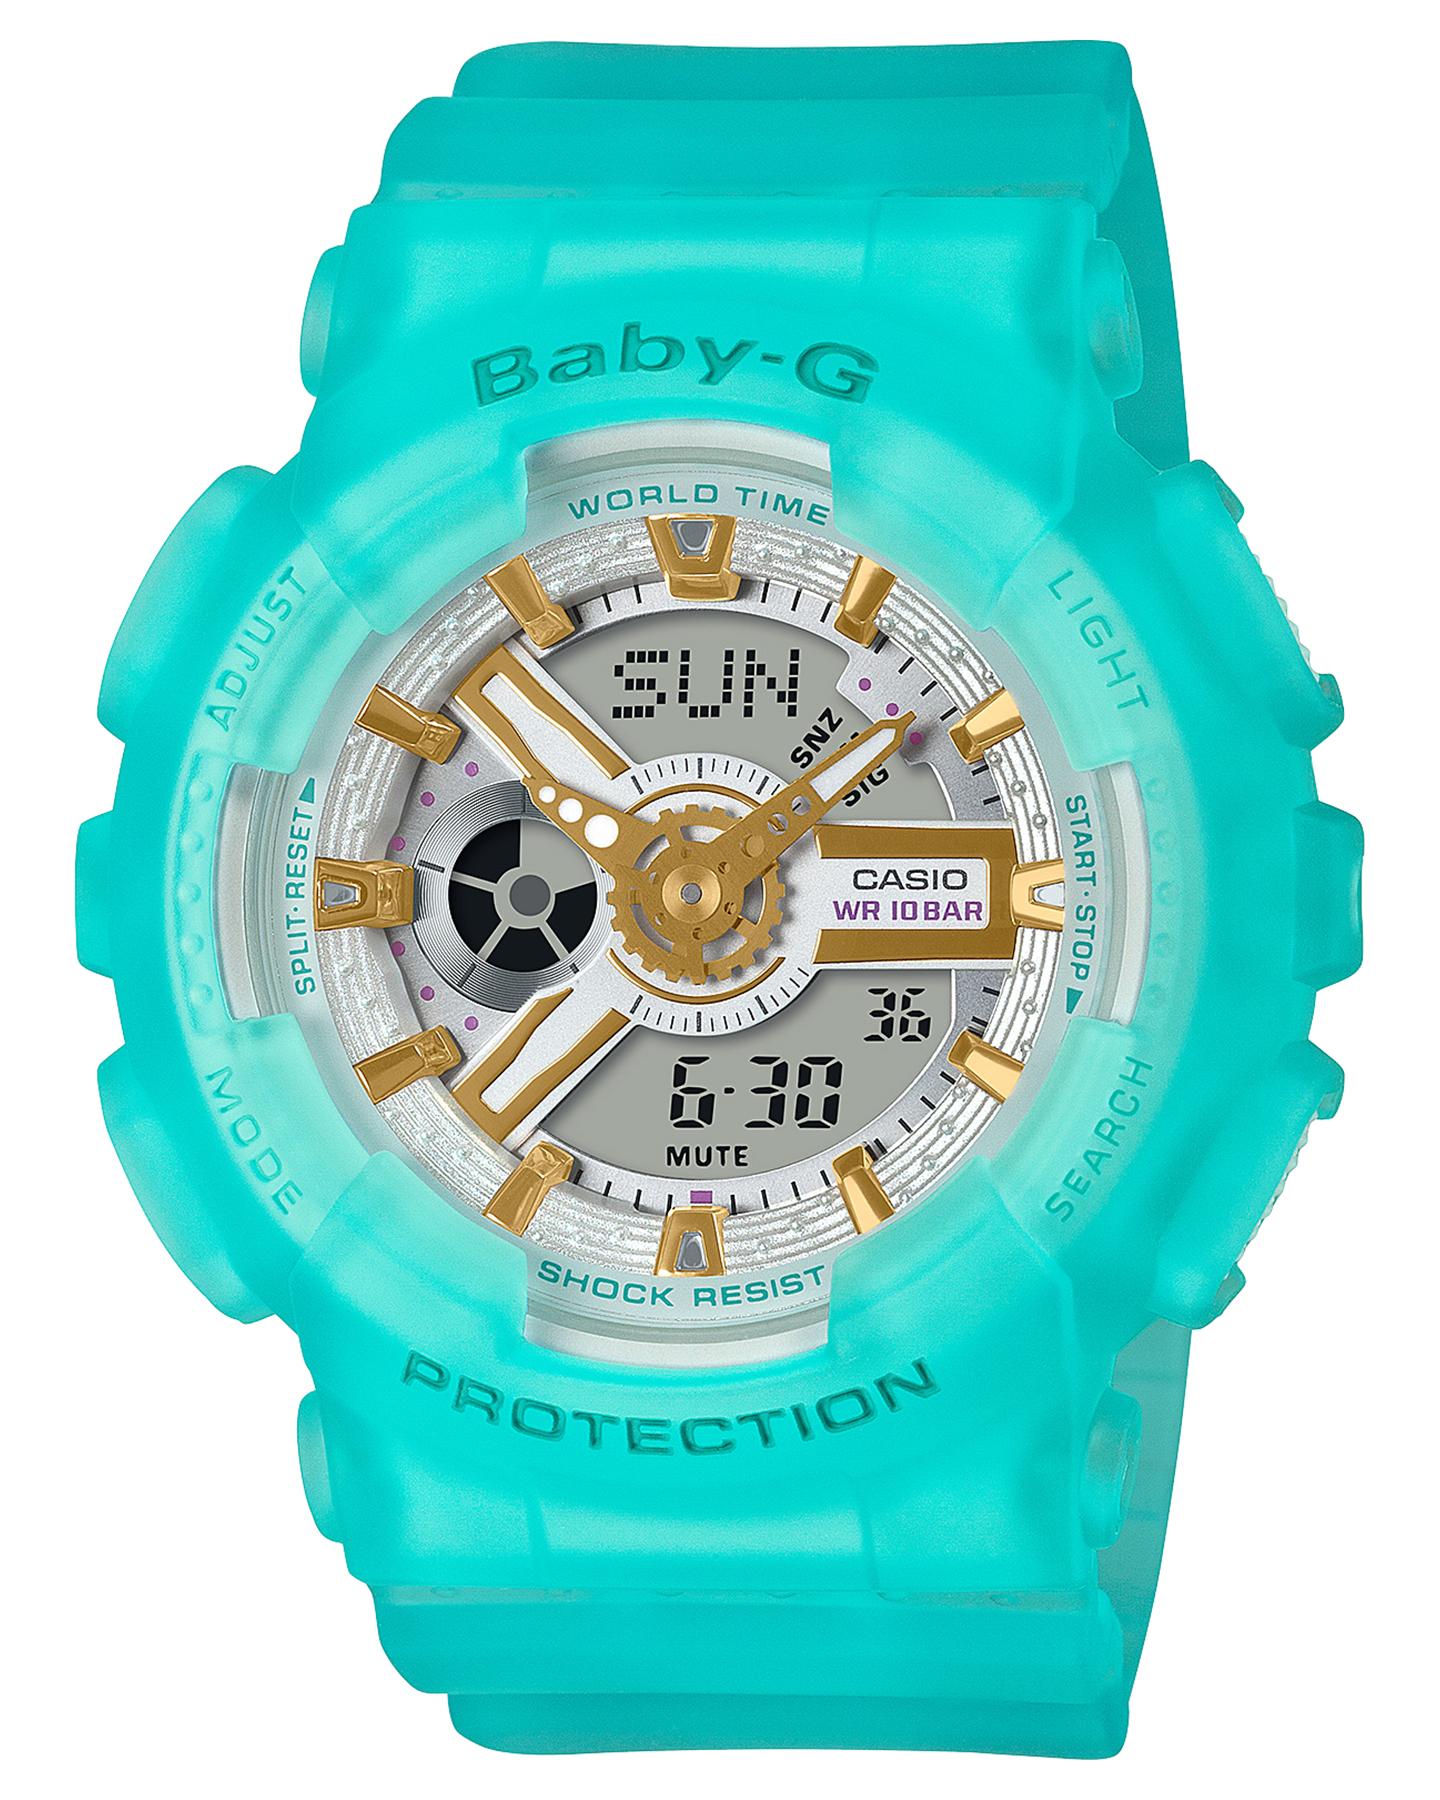 Baby G Ba110 Sea Glass Series Watch Mint Mint